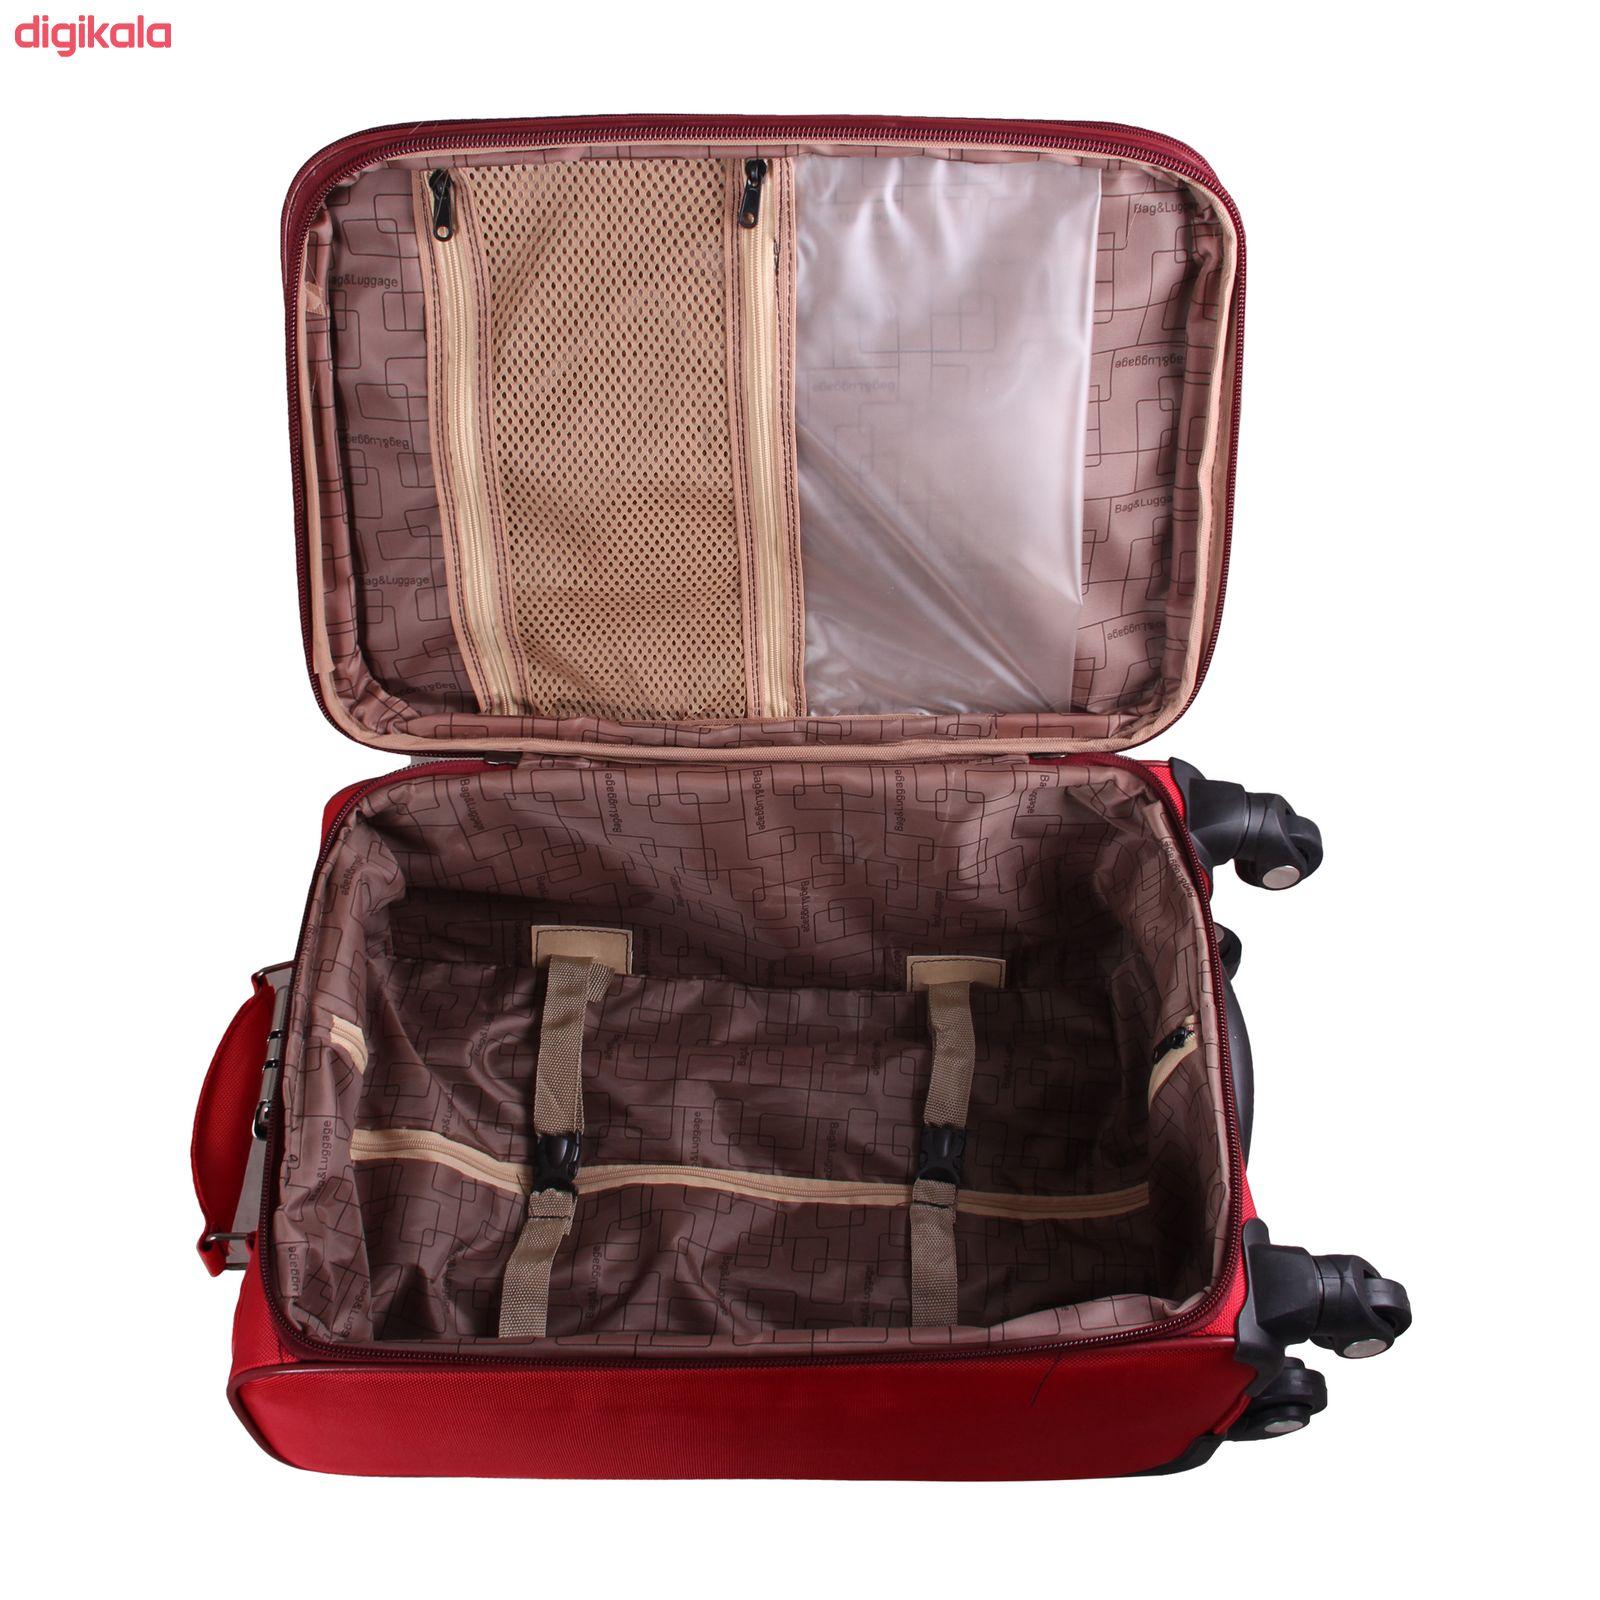 مجموعه سه عددی چمدان کدA1034 main 1 19